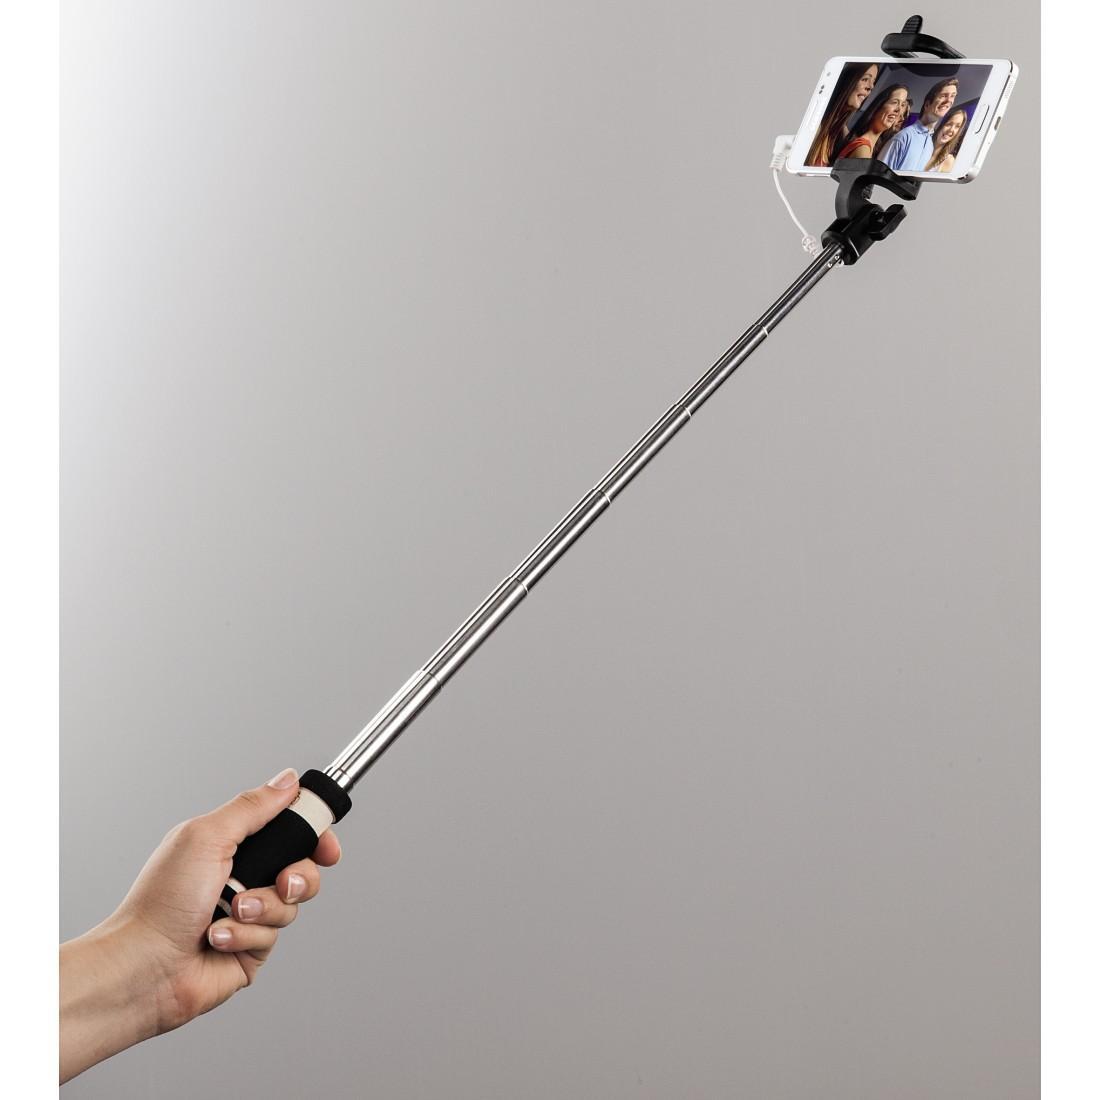 Монопод - селфи HAMA Pocket 139660, Вграден кабел с 3.5мм жак, Метал, Черен